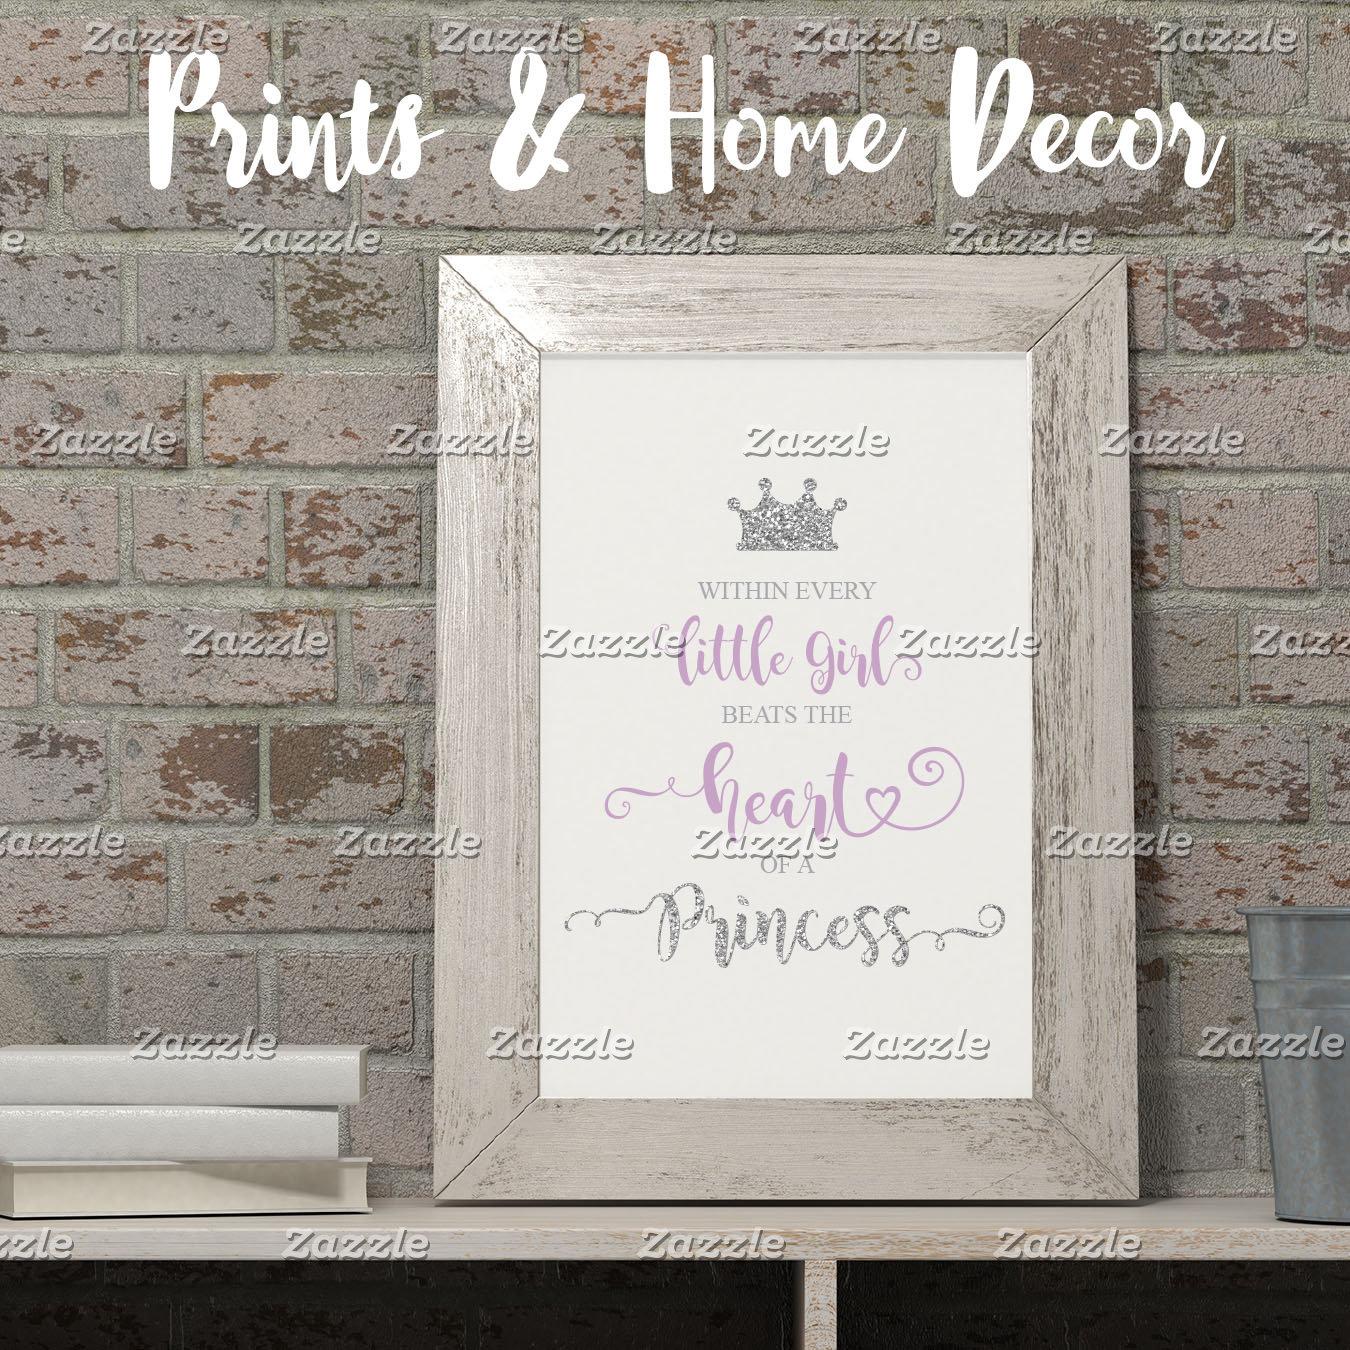 Prints & Home Decor